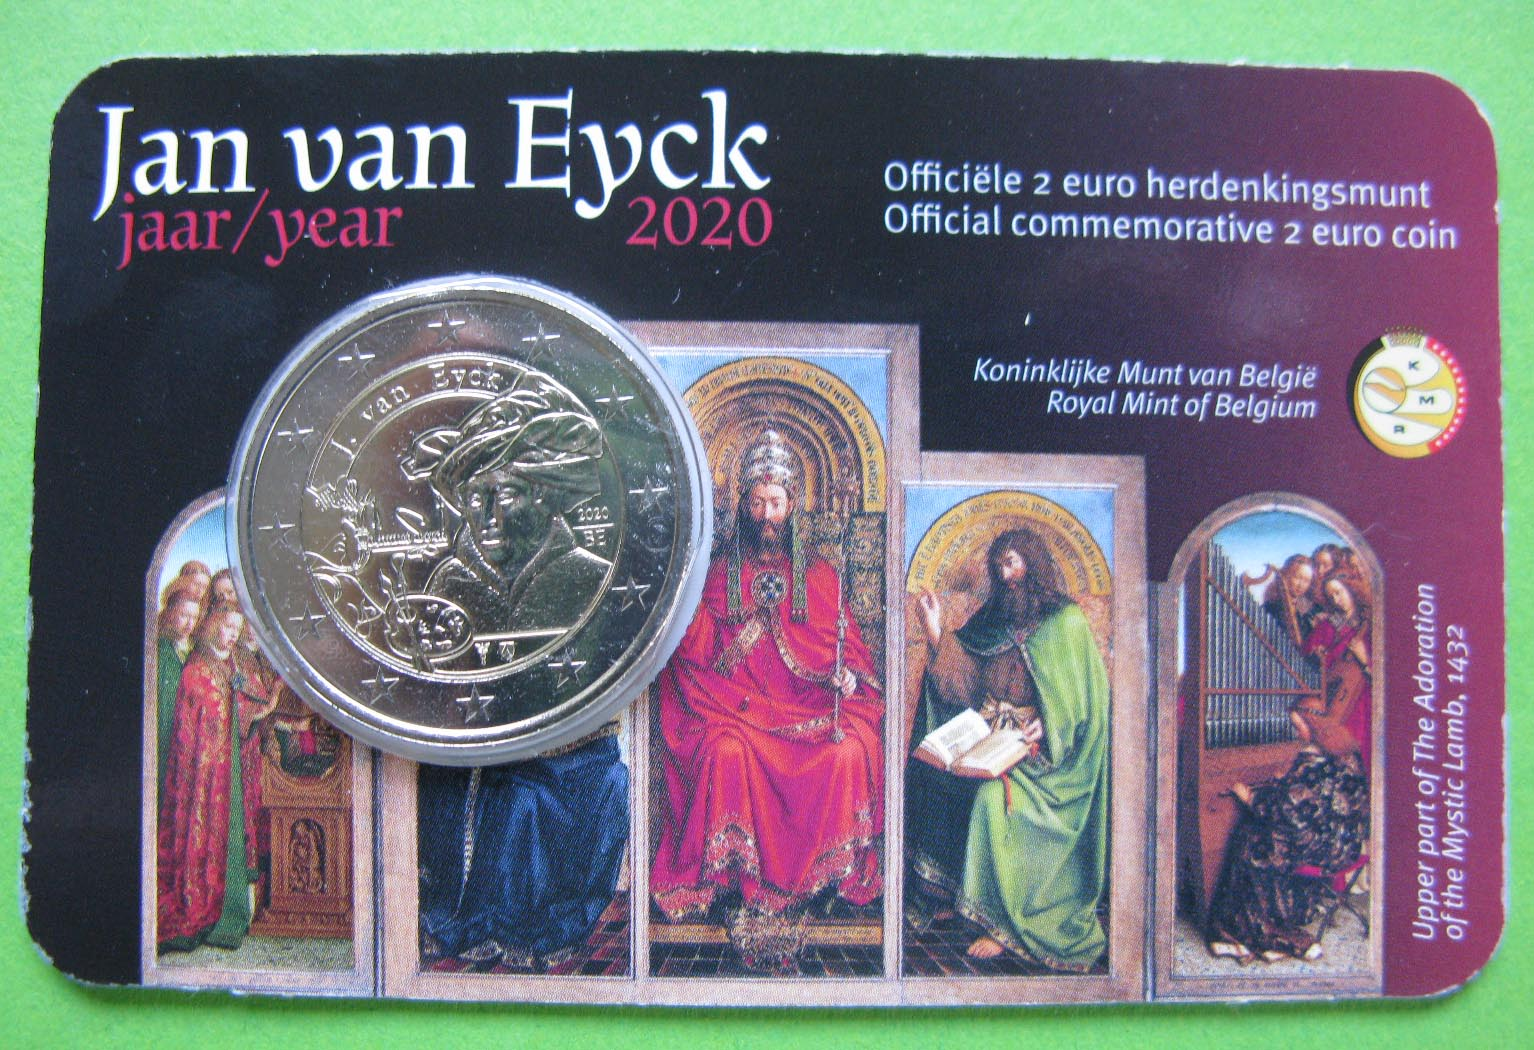 Бельгия 2 евро 2020 г. Ян ван Эйк